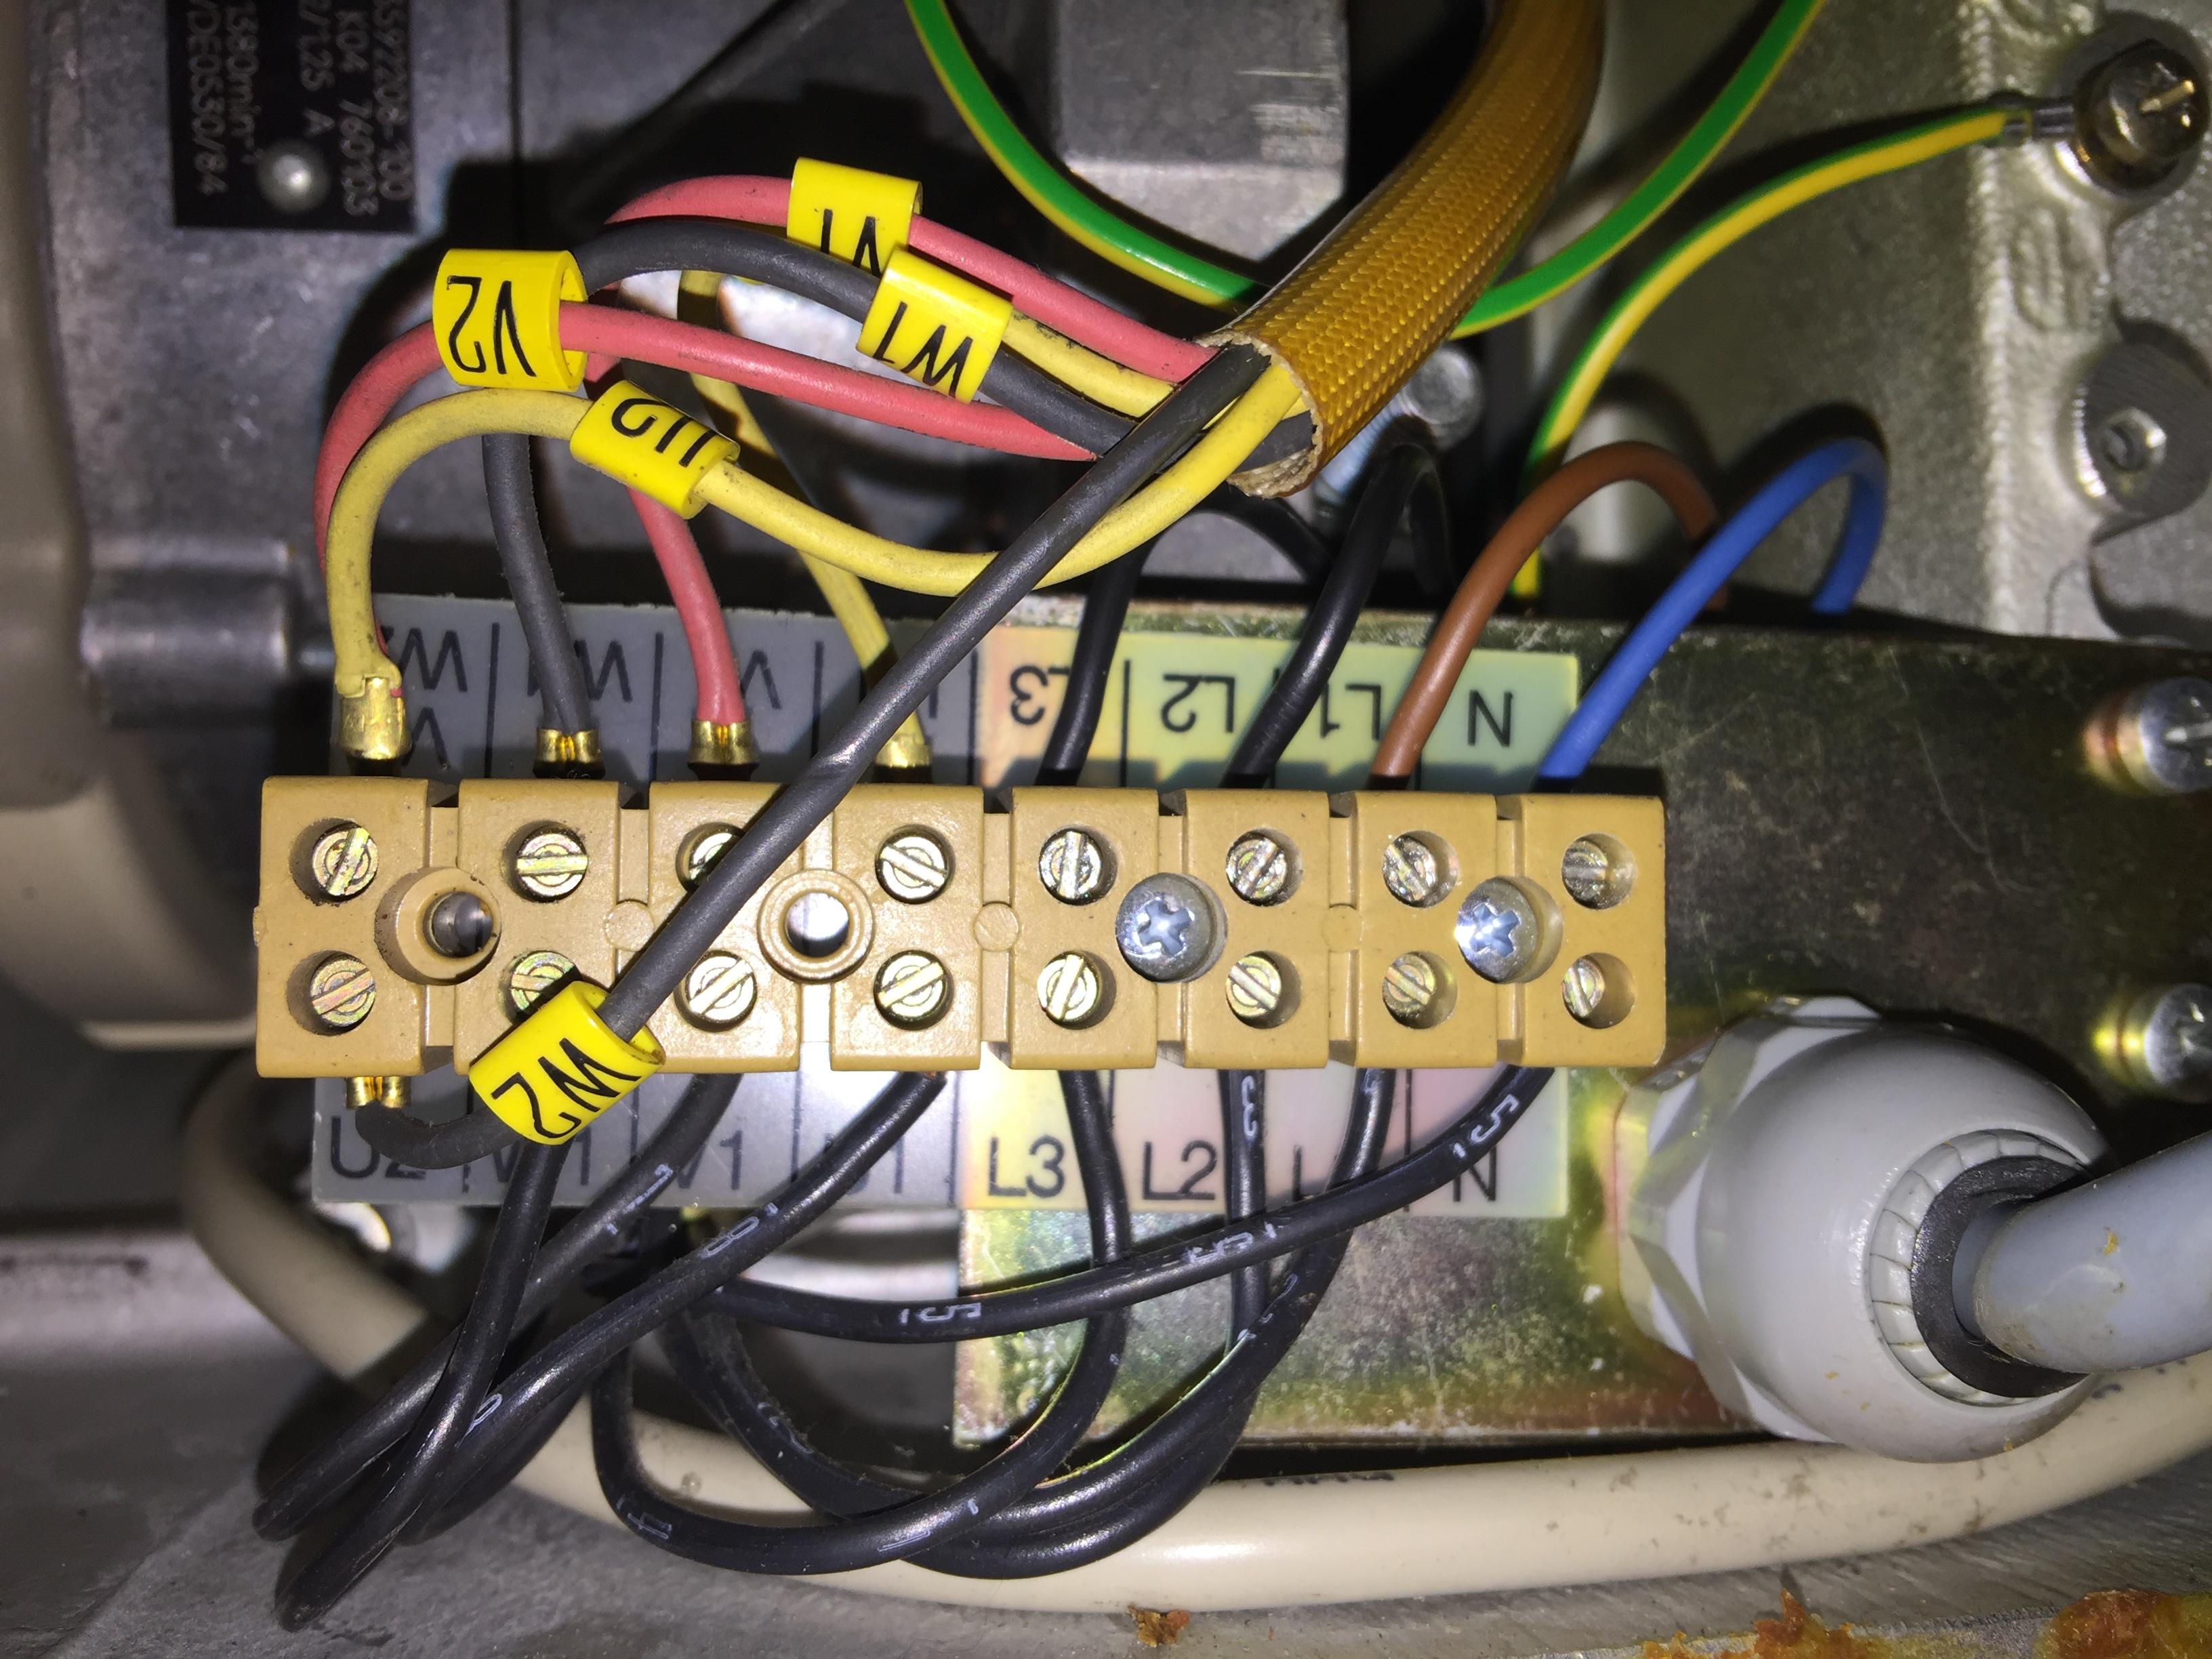 Erfreut 220 V Verkabelung 4 Draht Elektro Noch Fotos - Der ...